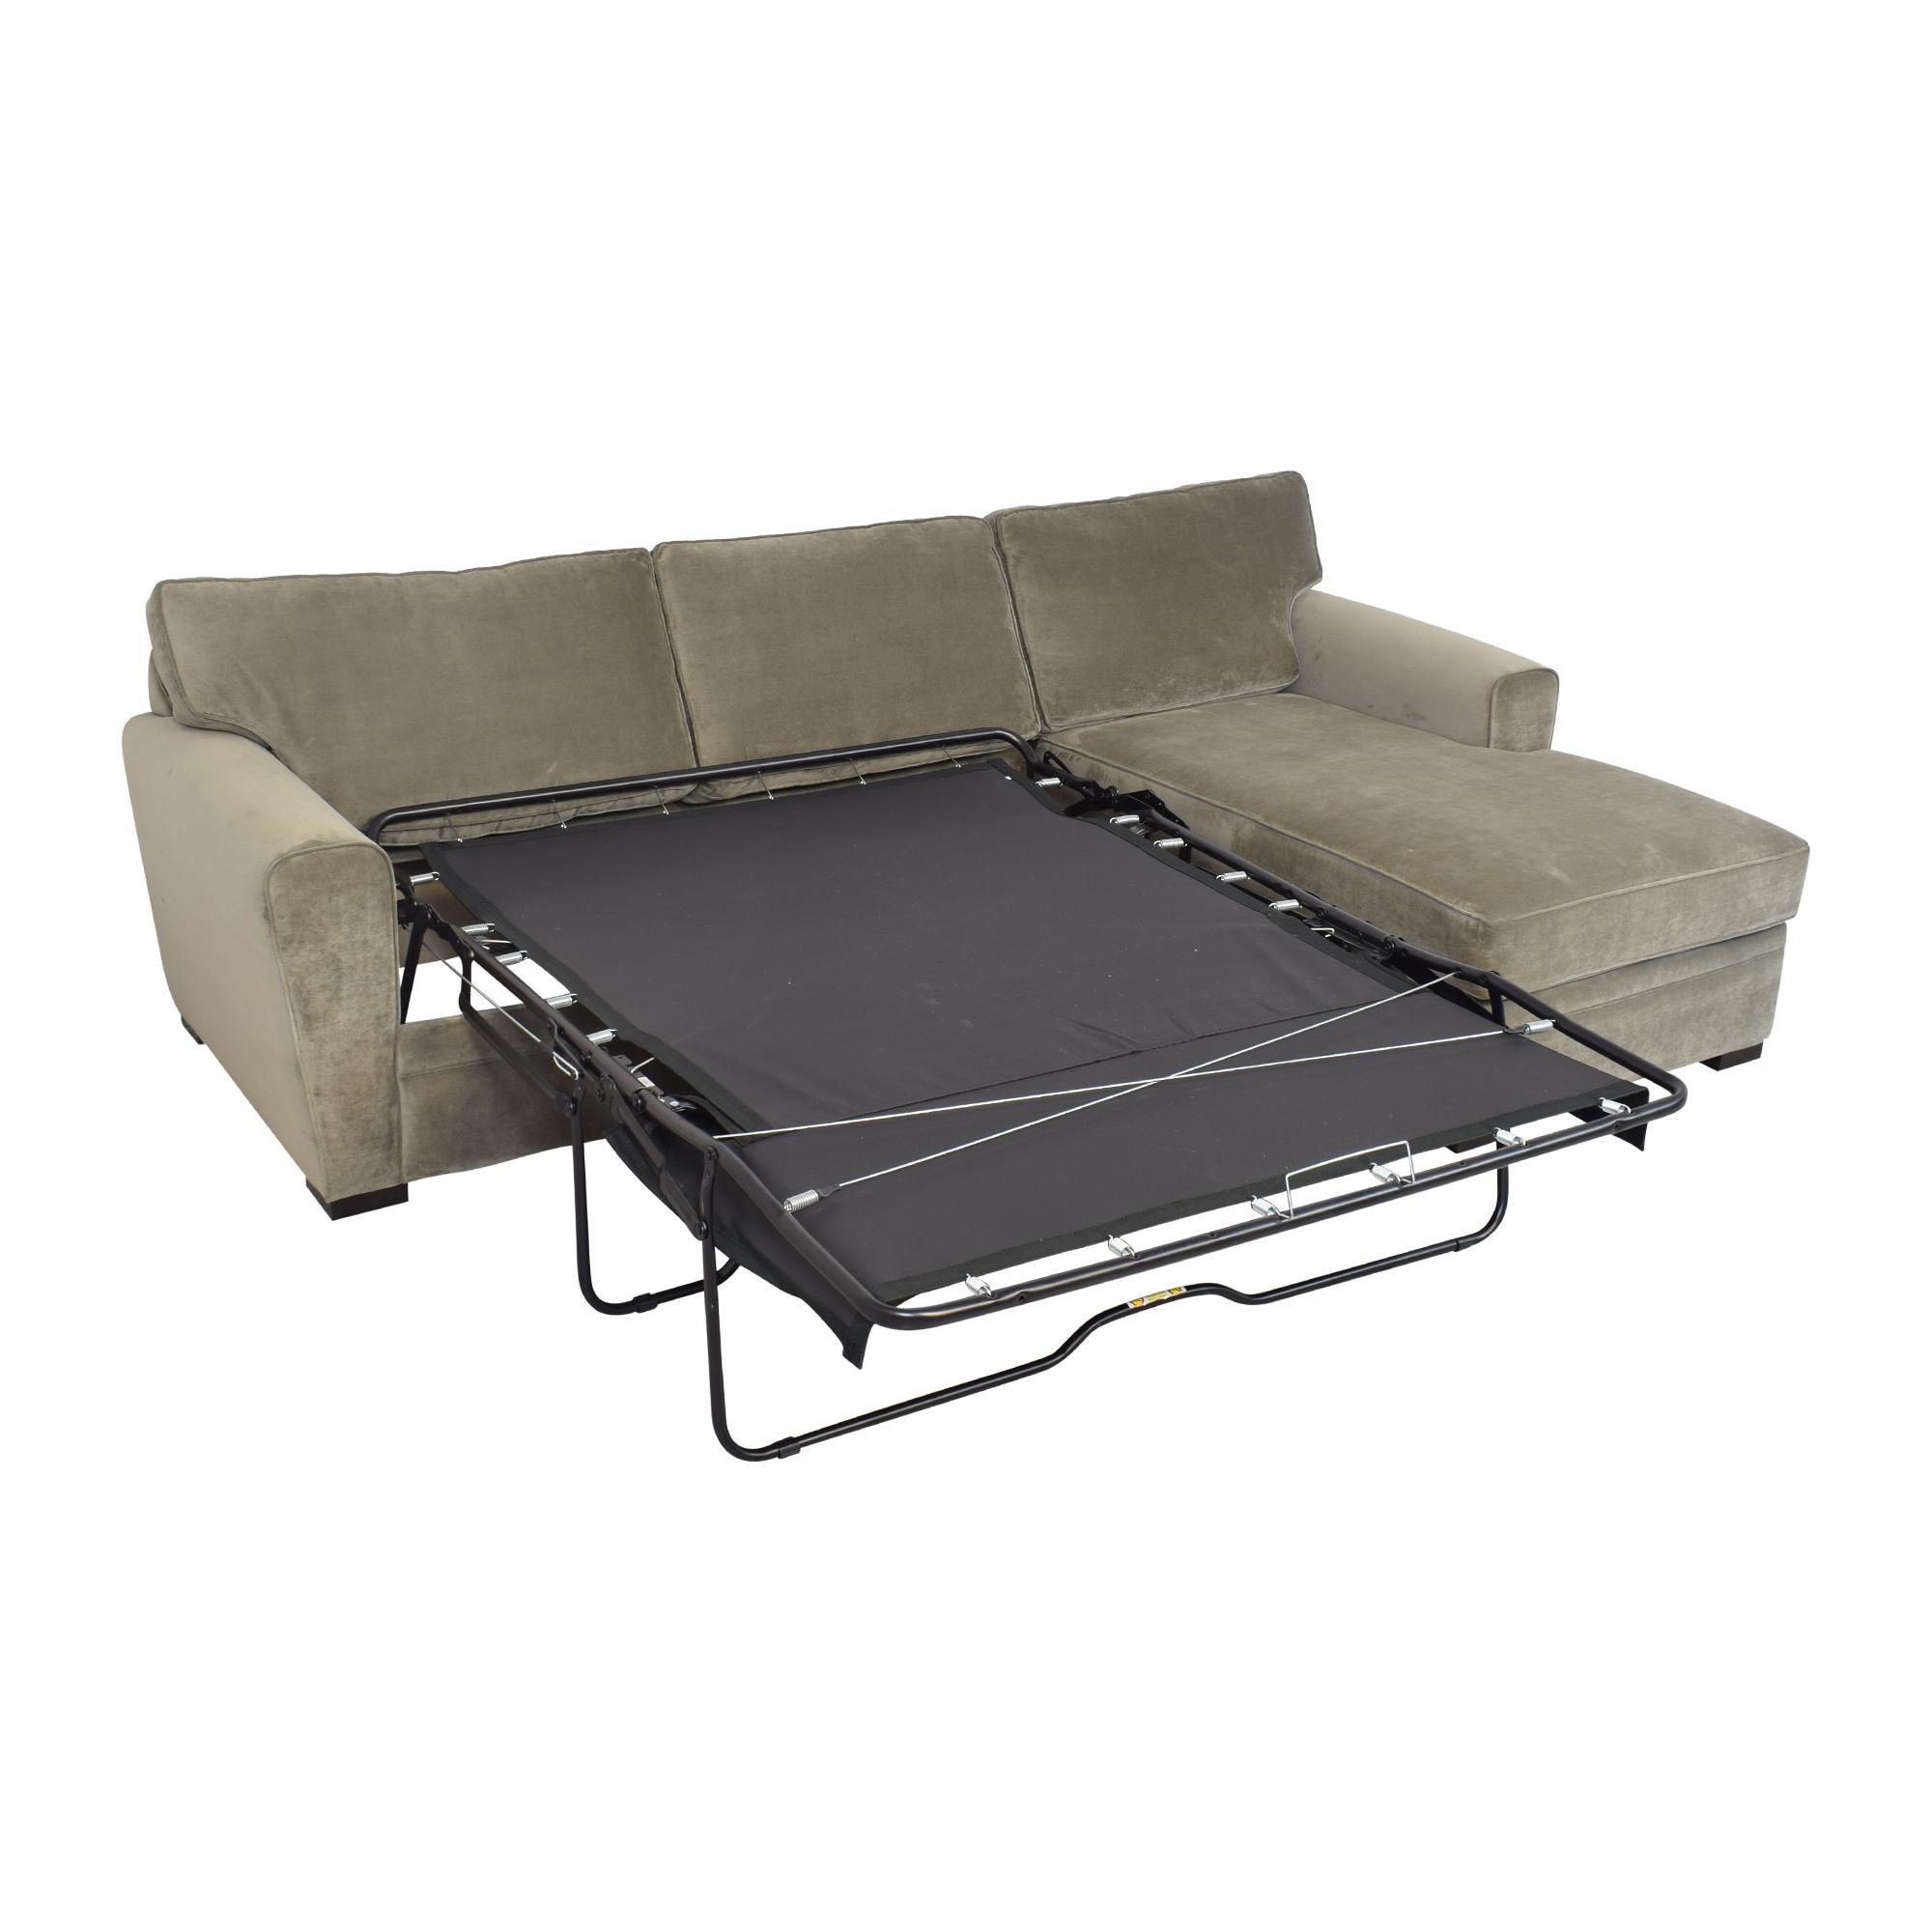 Raymour & Flanigan Raymour & Flanigan Artemis II Sectional Sofa with Sleeper for sale